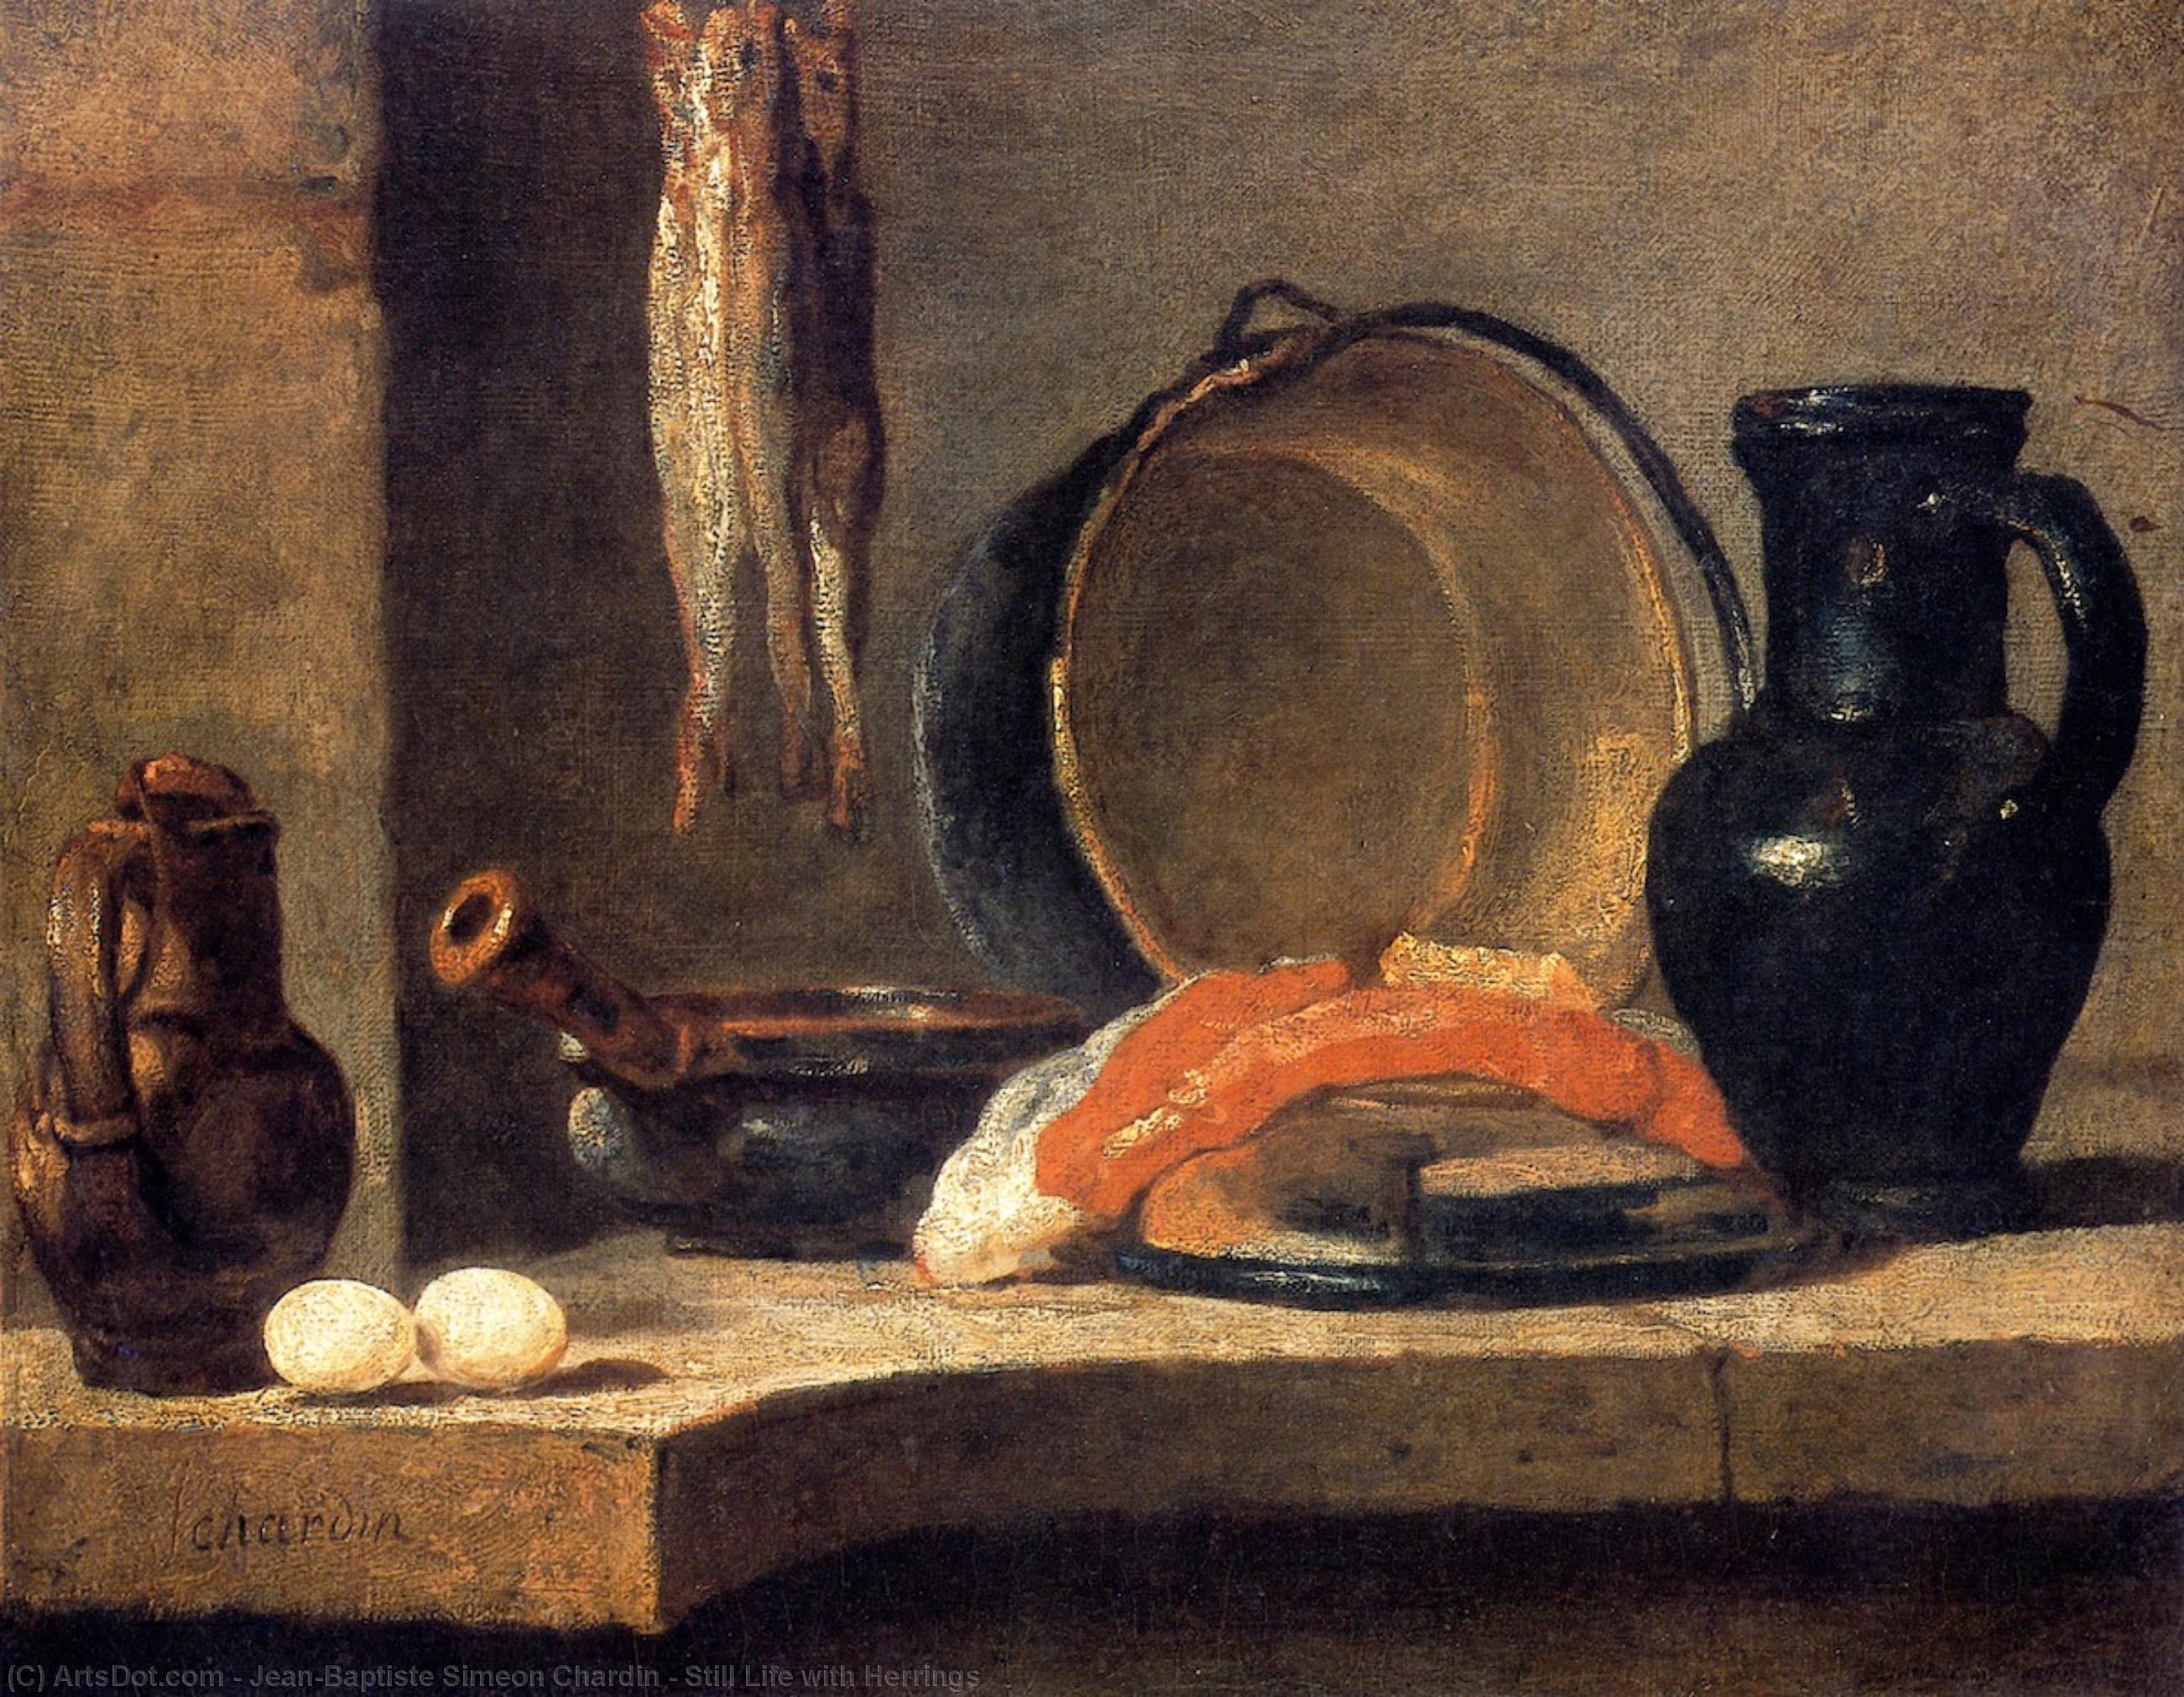 WikiOO.org - Encyclopedia of Fine Arts - Lukisan, Artwork Jean-Baptiste Simeon Chardin - Still Life with Herrings